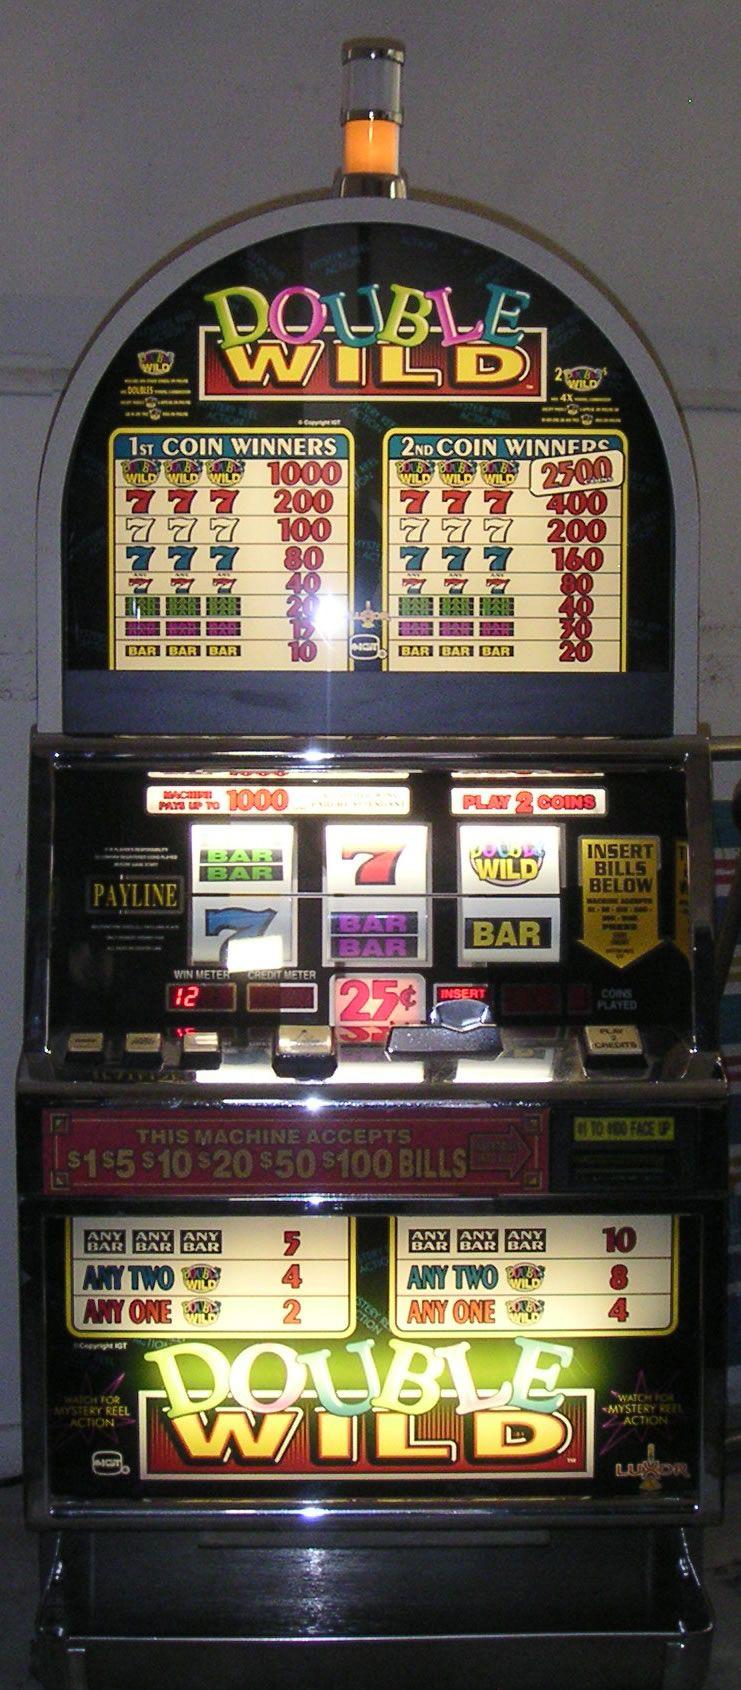 Twewy more pin slots